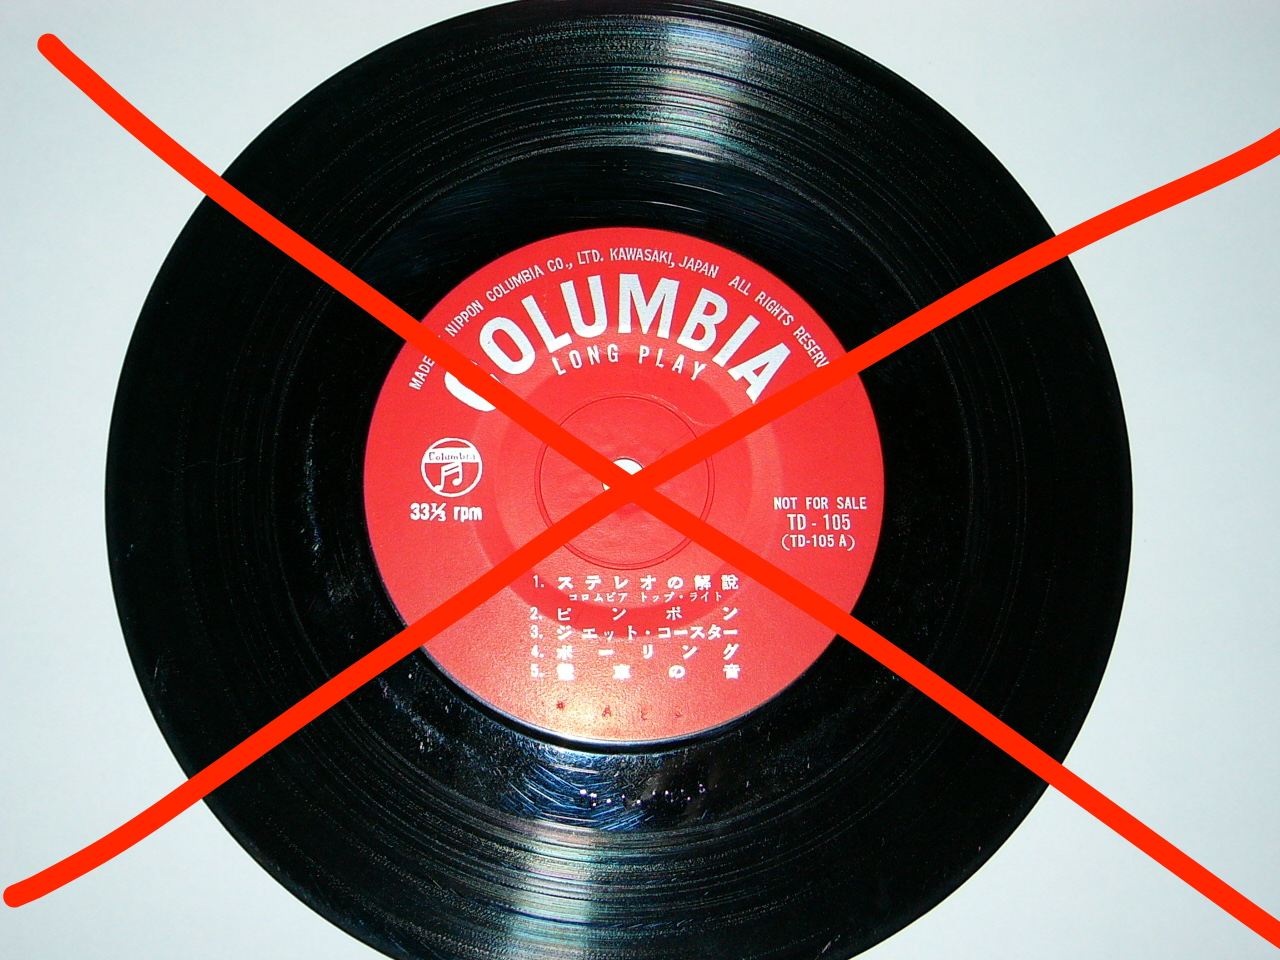 Russ Solomon, Tower Records, Vinyl, Video, iPhone, Smartphone